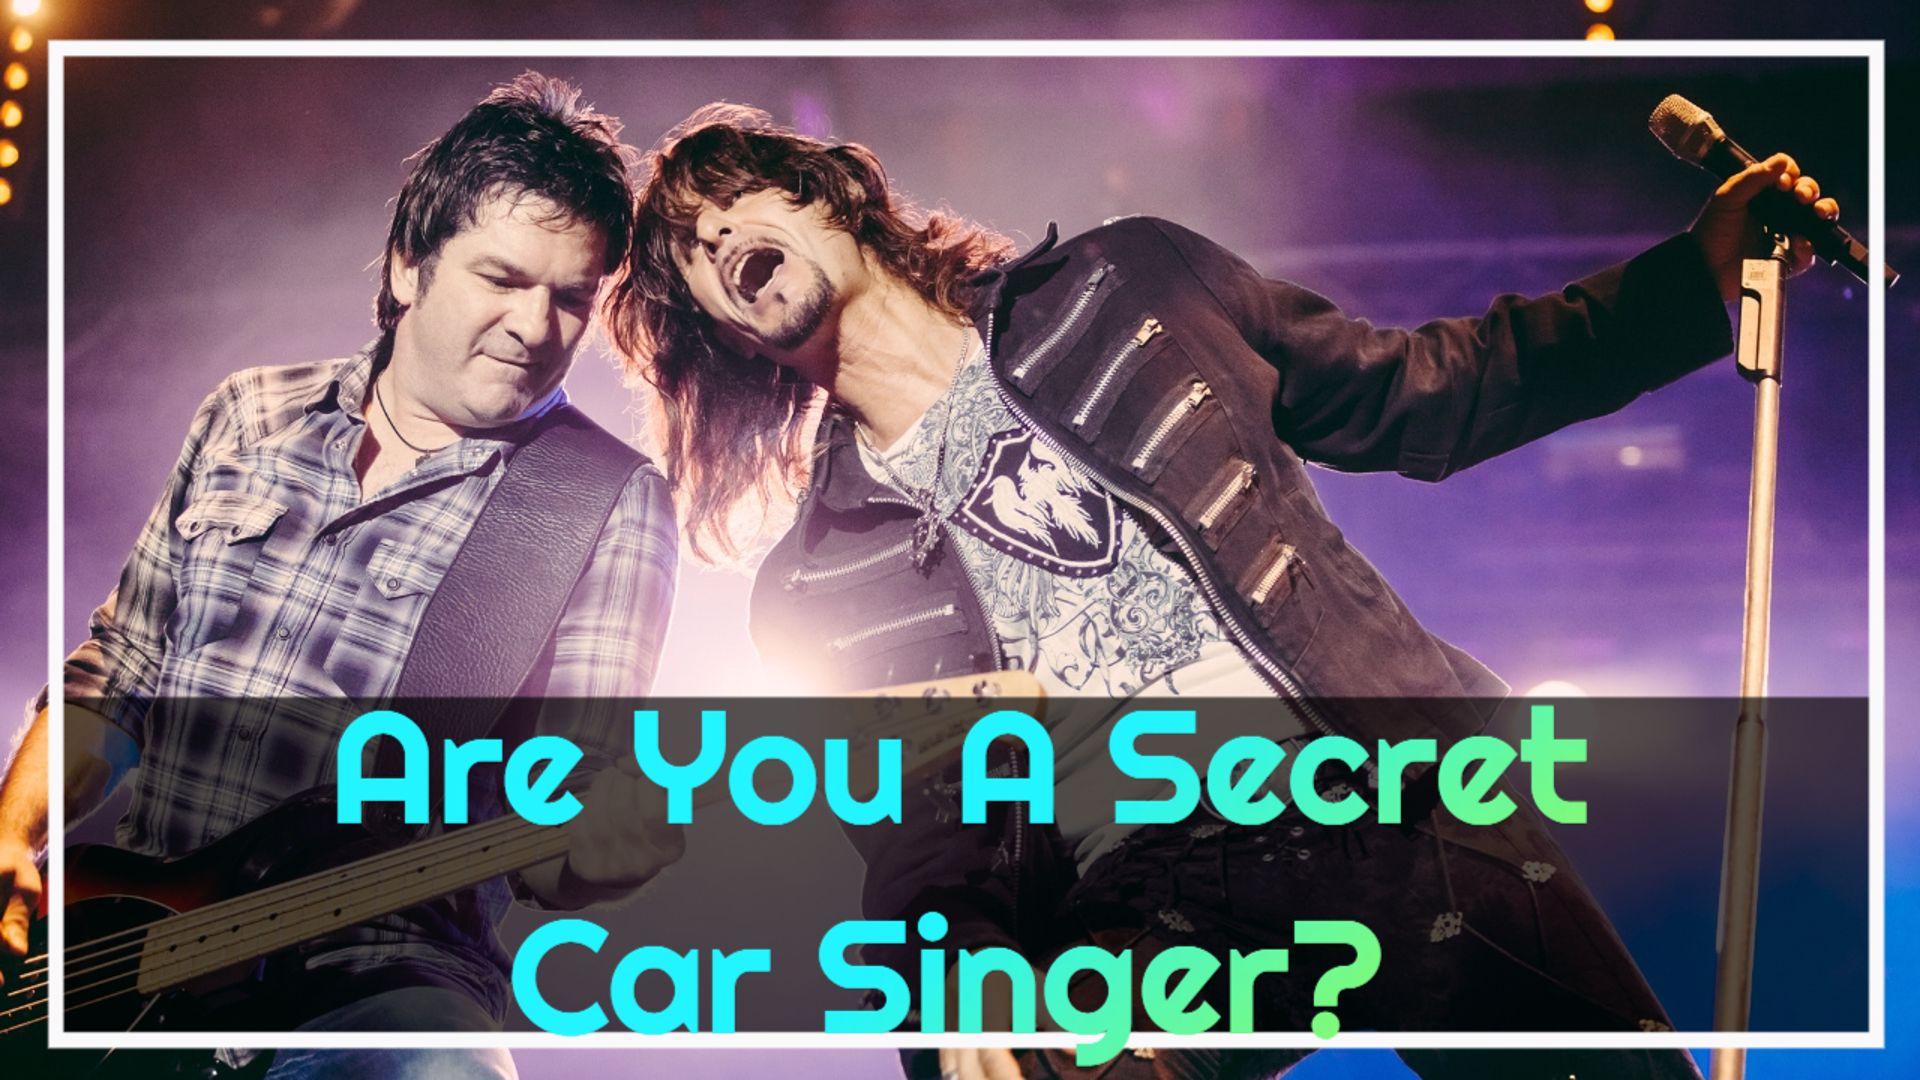 Are You A Secret Car Singer?